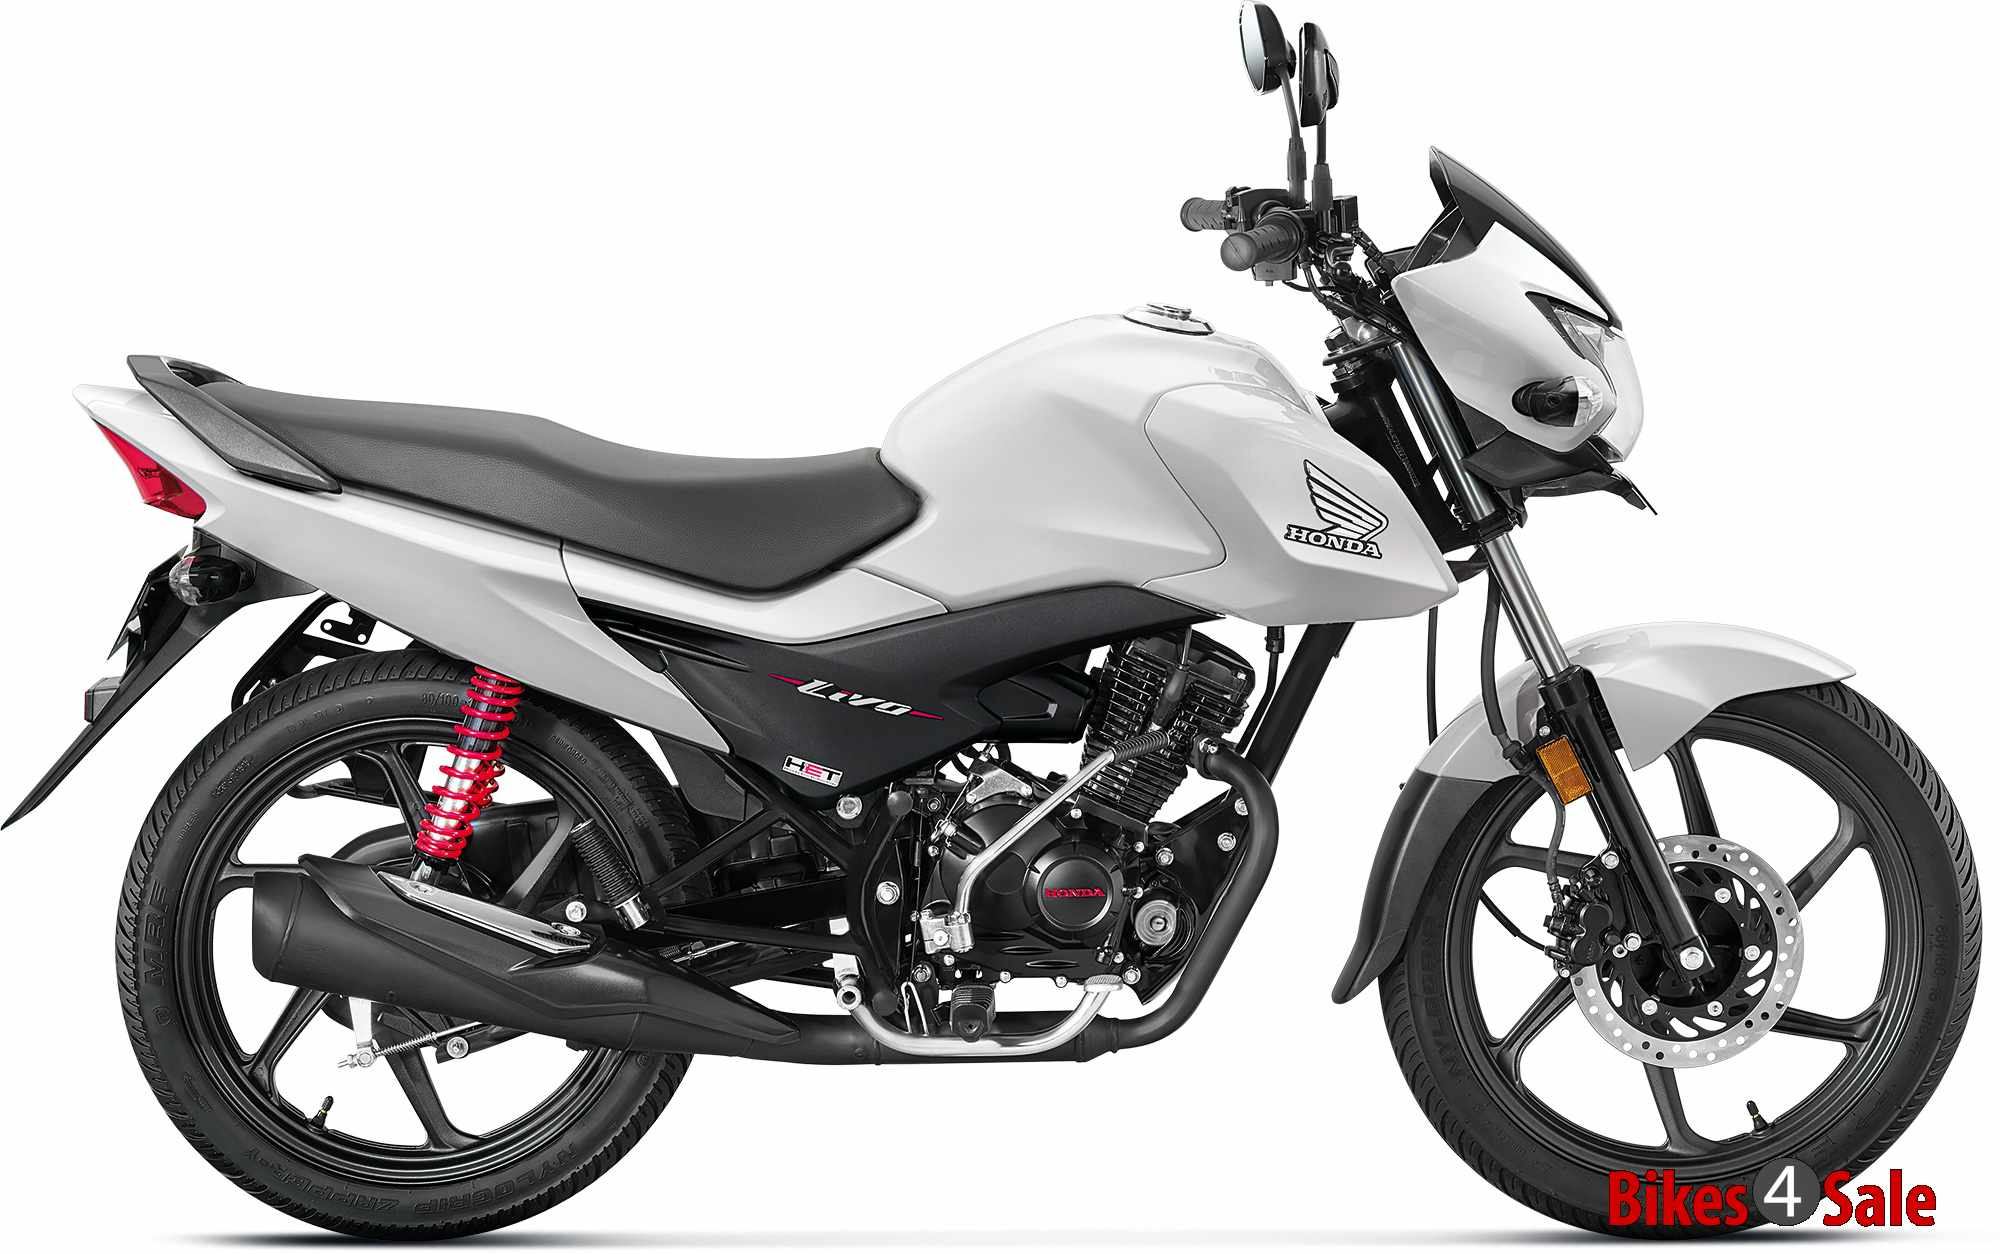 Atv bikes price in bangalore dating 6